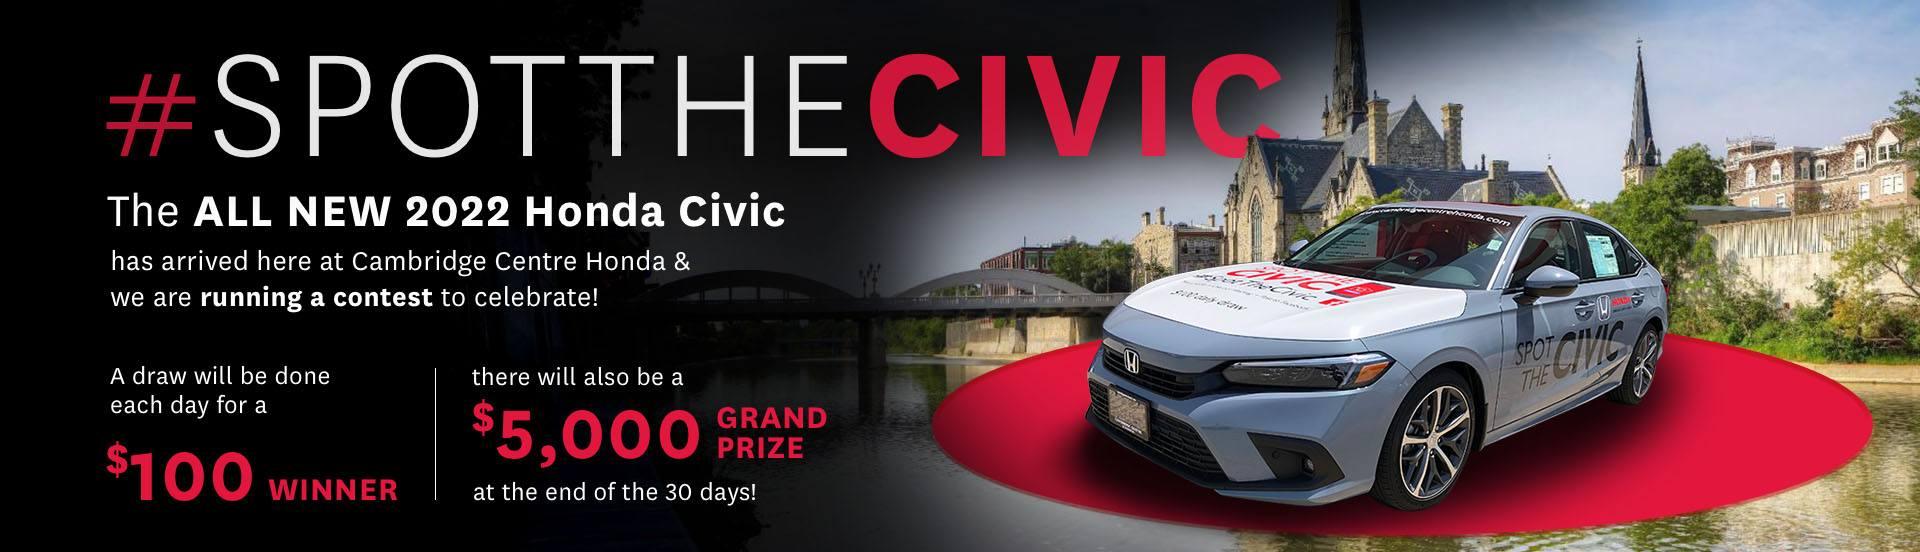 2022 Honda Civic Promotional Banner